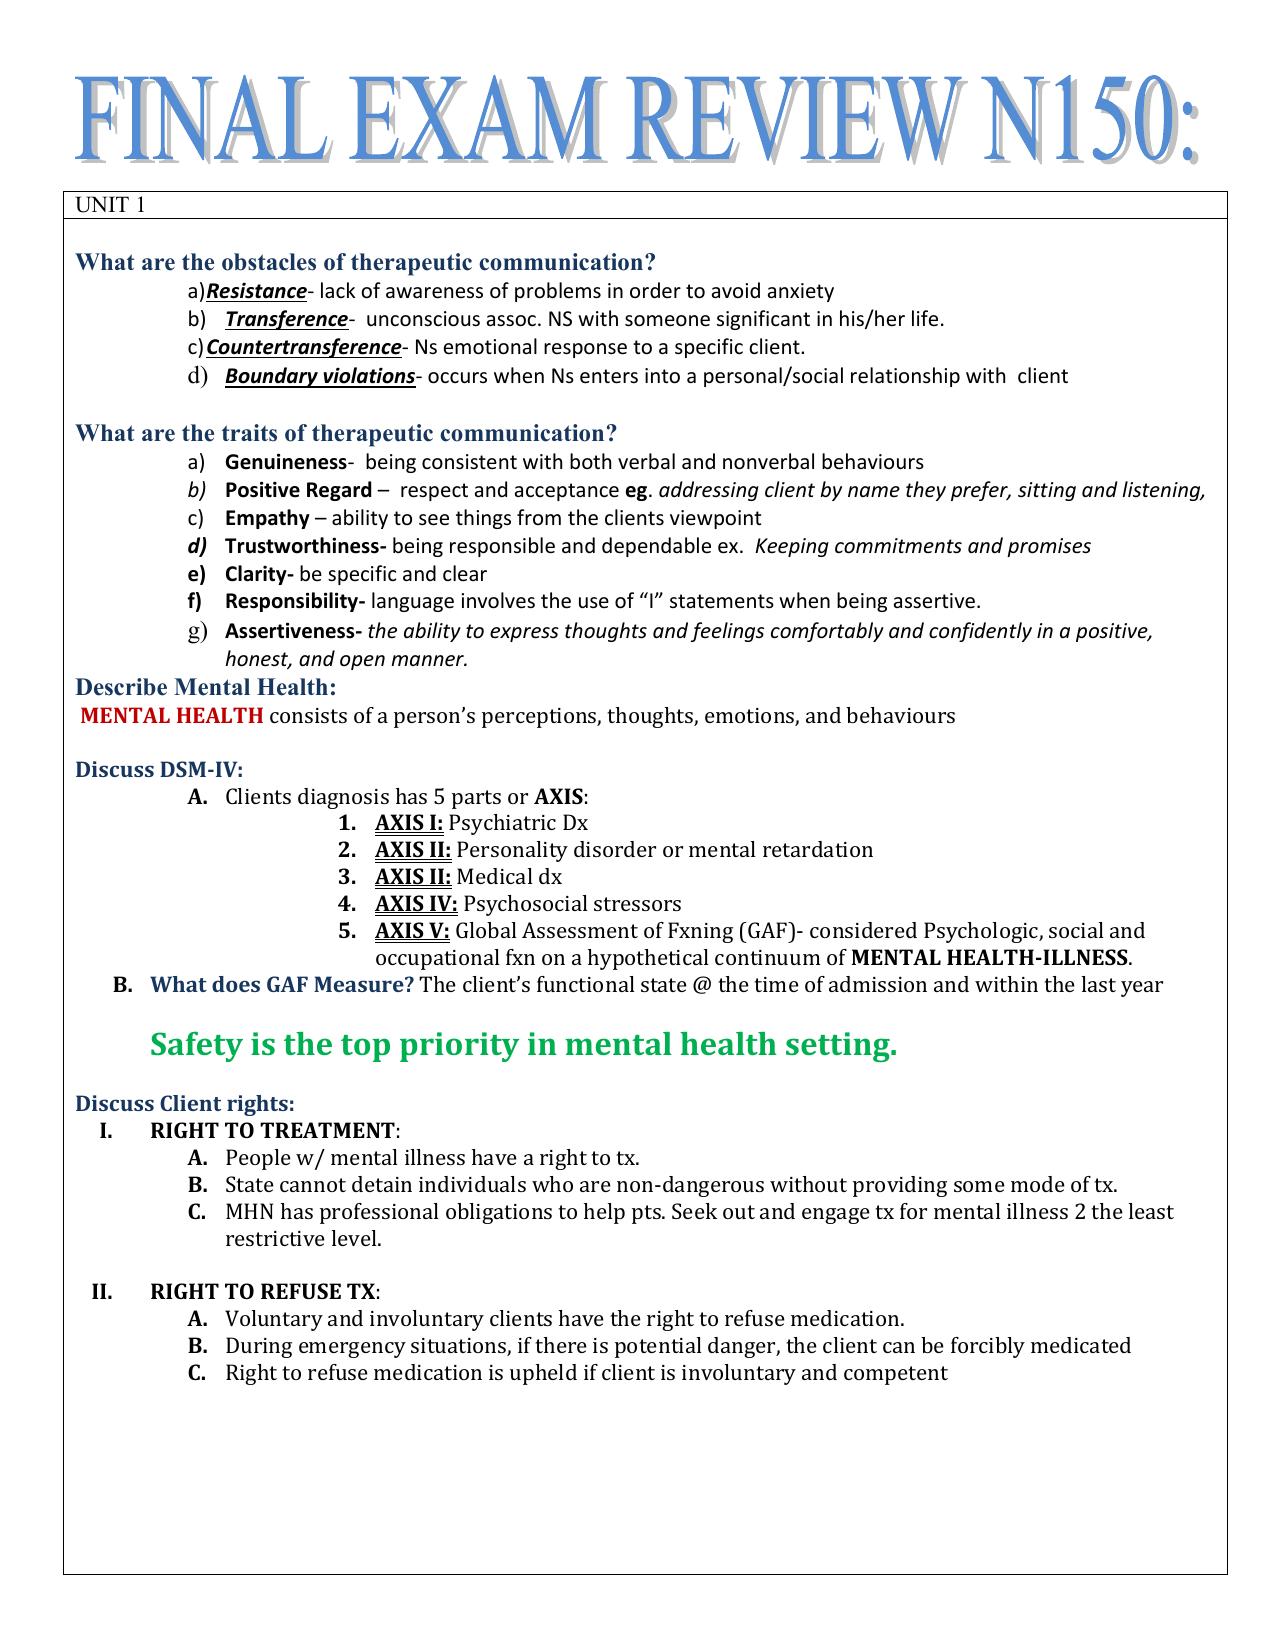 ATI Mental Health Nursing notes